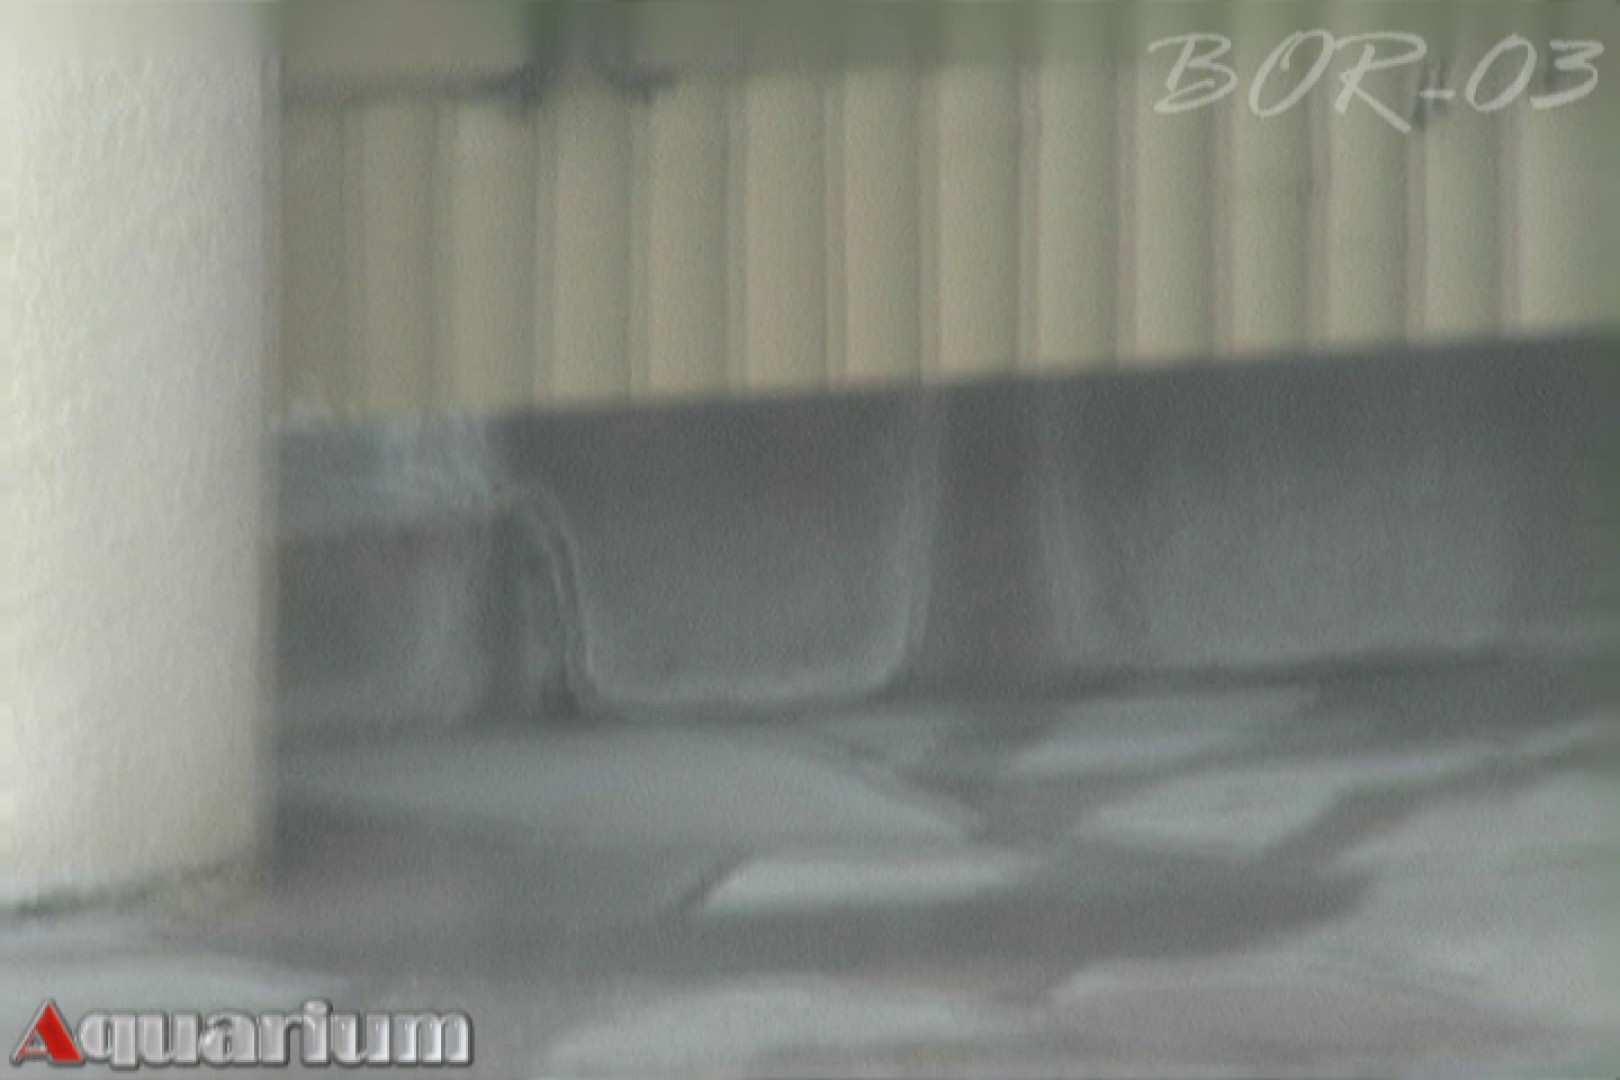 Aquaな露天風呂Vol.489 覗き エロ無料画像 11枚 8